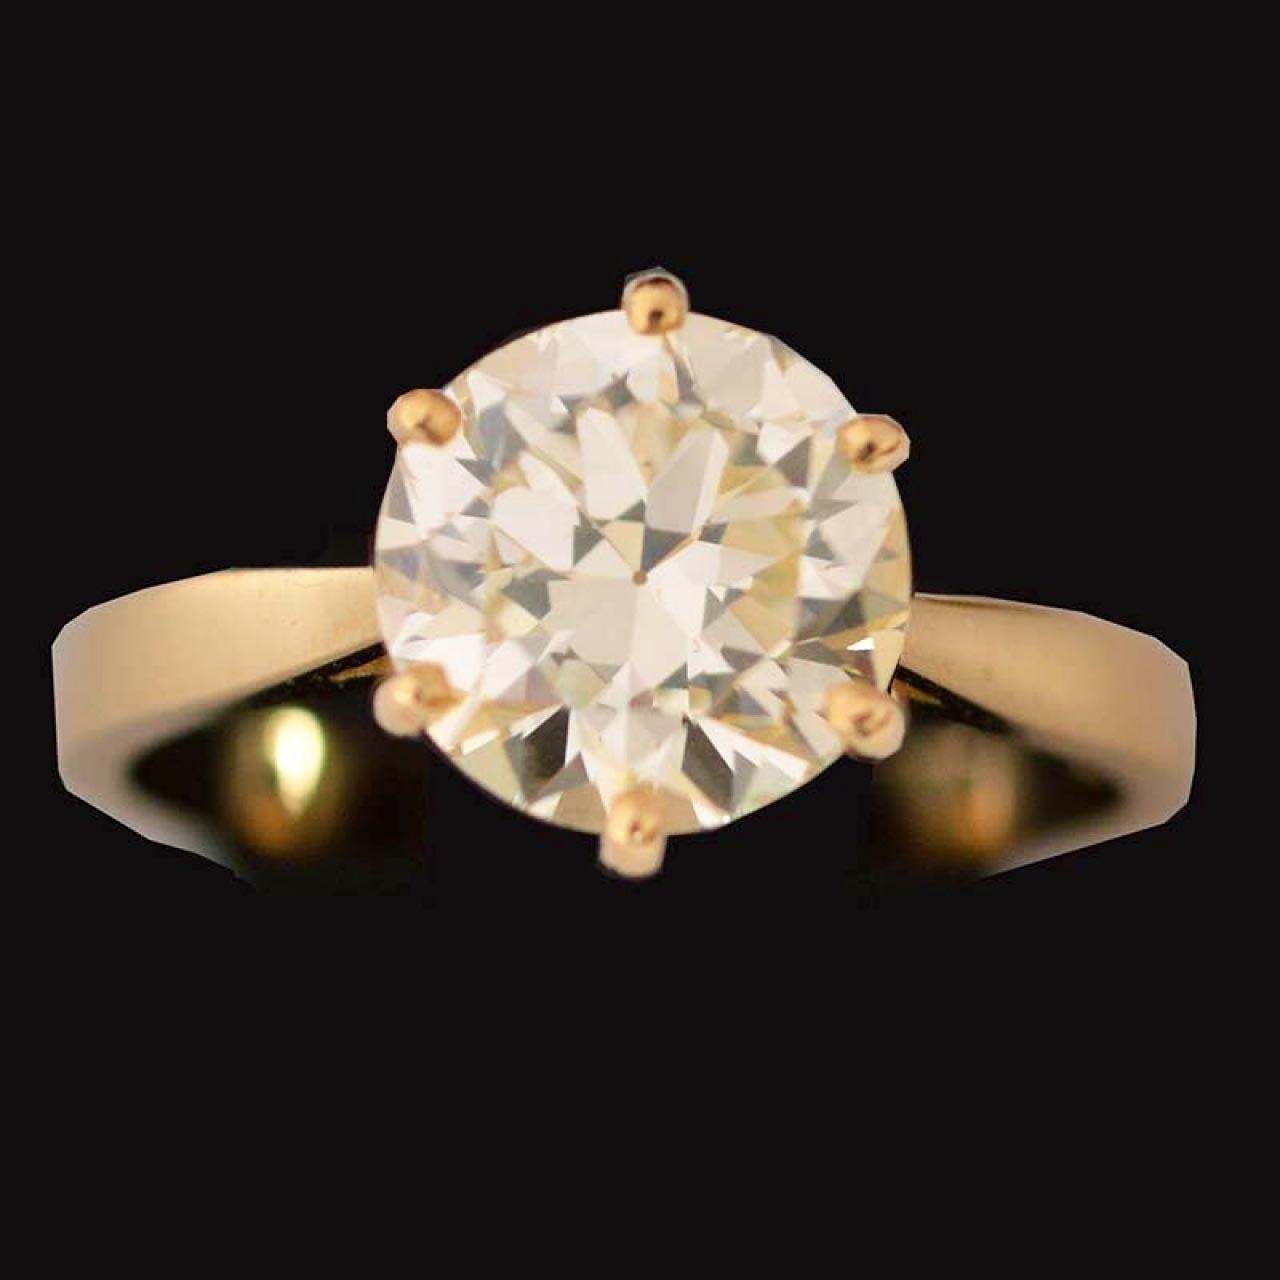 2.33 crt diamanten solitair ring